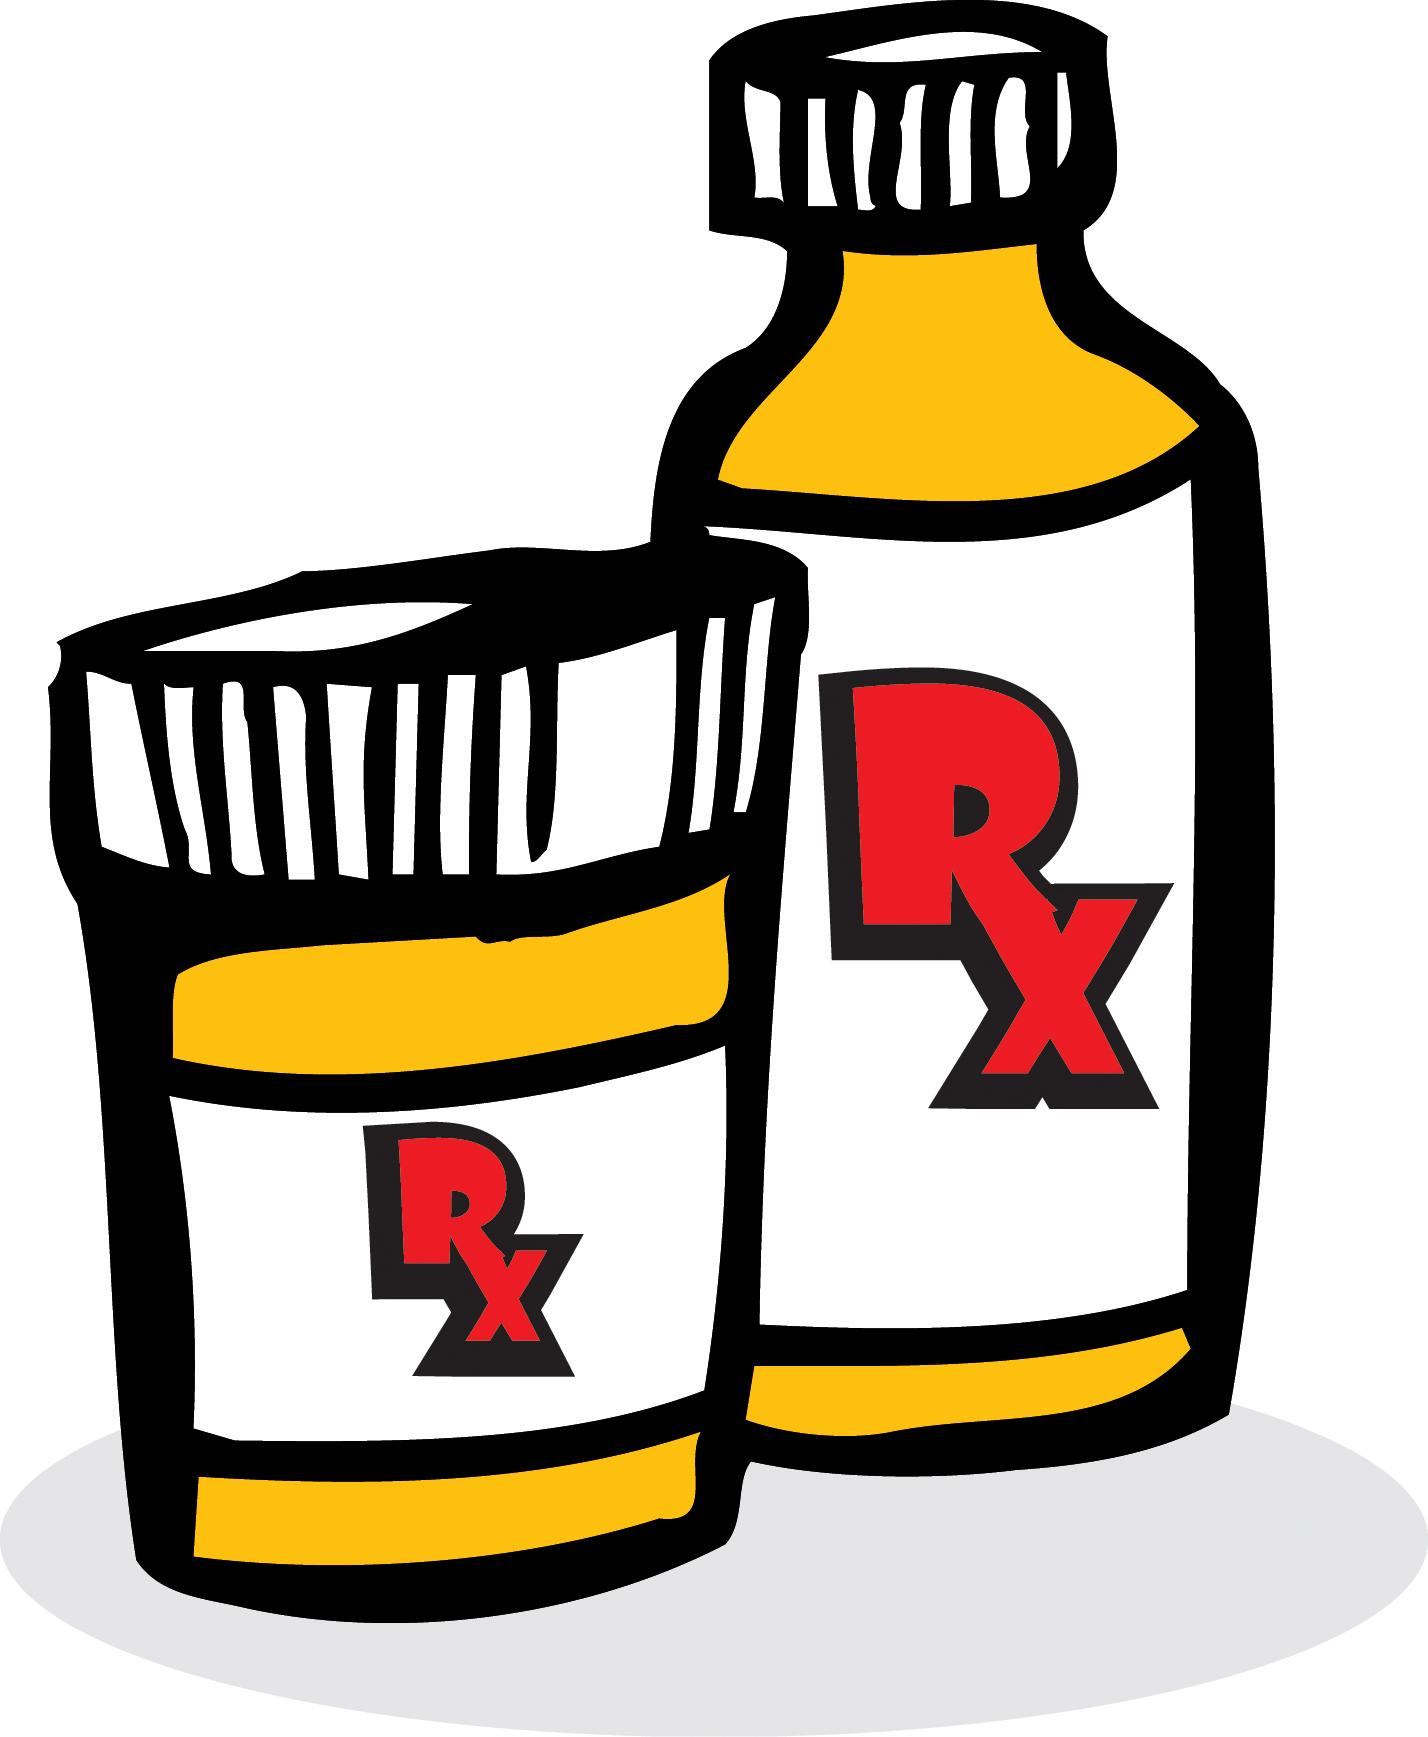 Prescription Bottle Clip Art N4 free image.